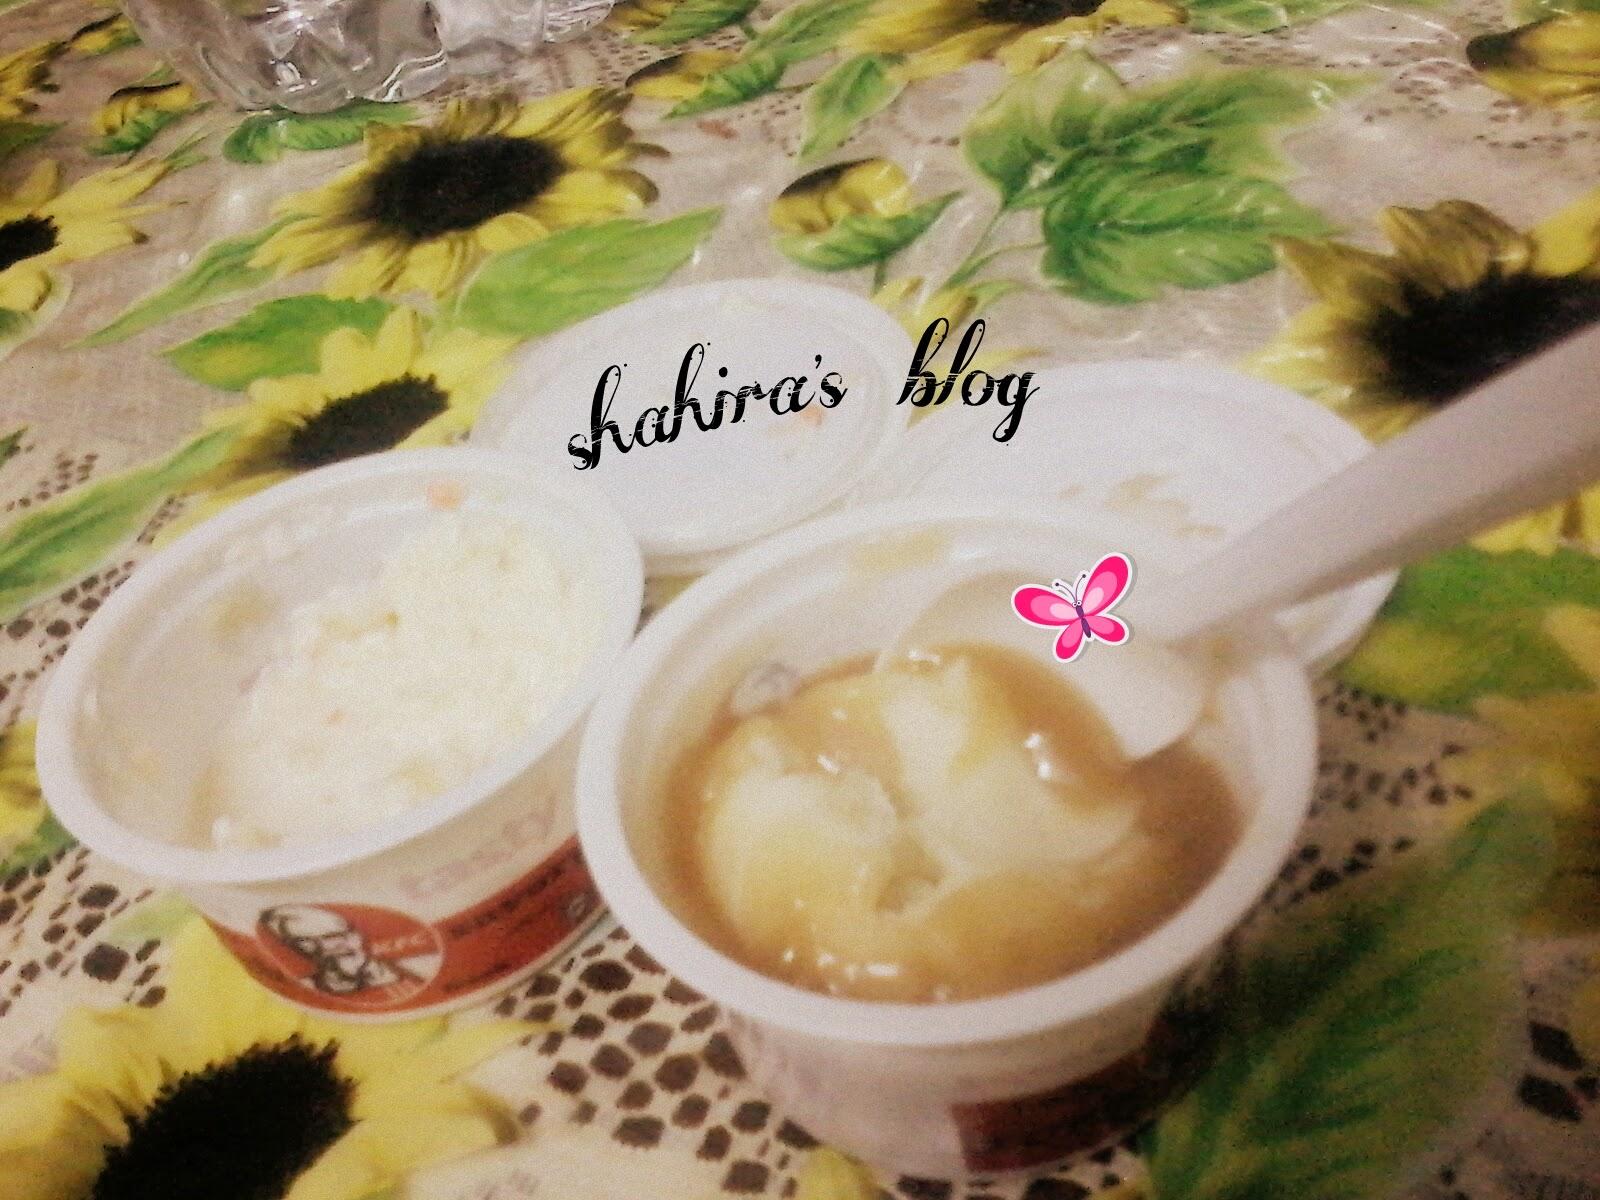 KFC whipped potato and coleslaw